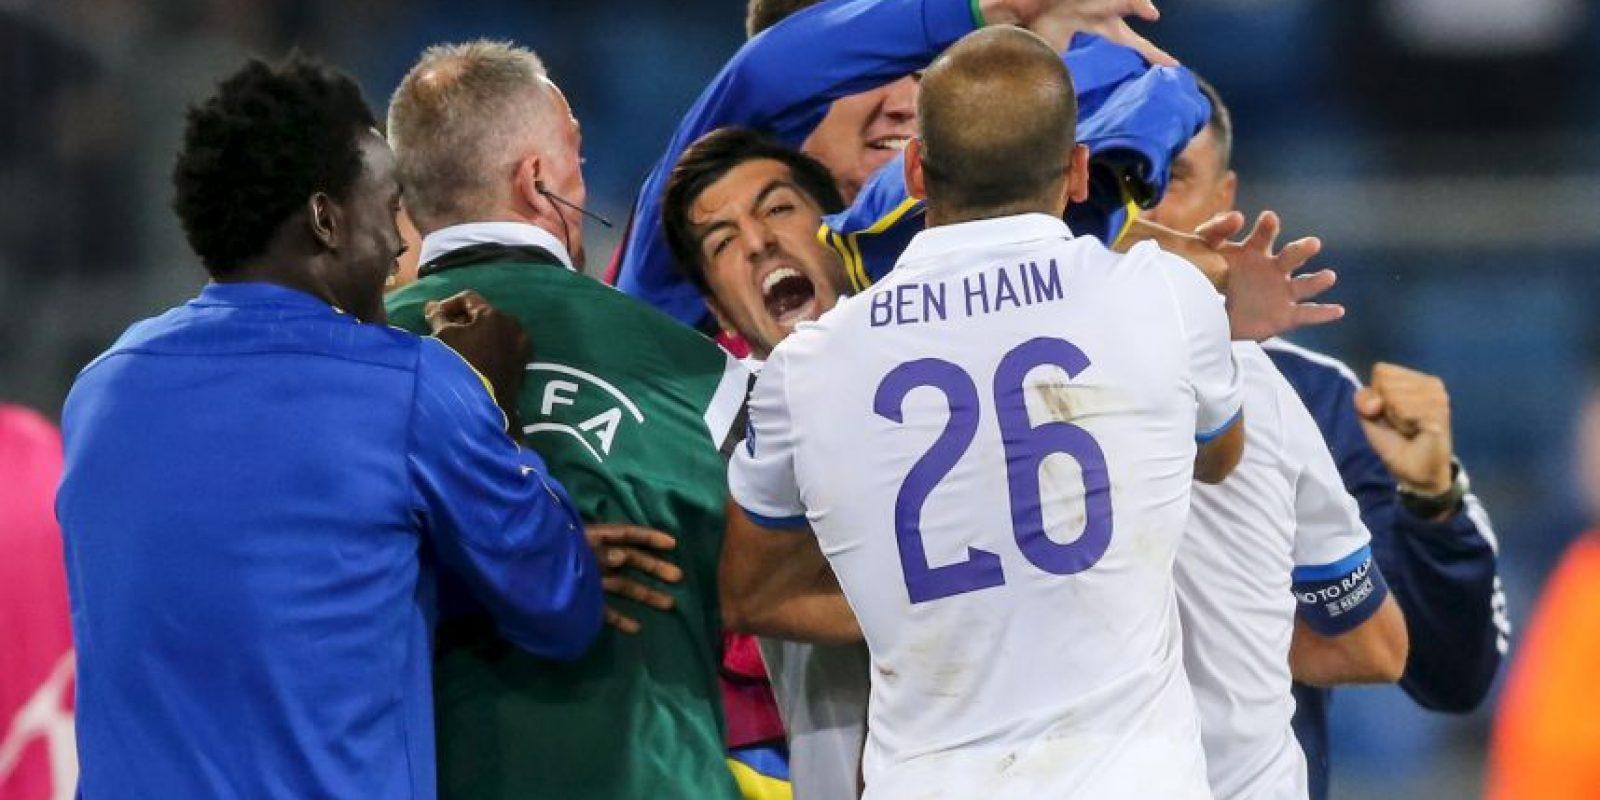 Maccabi Tel-Aviv. Valor del plantel: 21.55 millones de euros Foto:Getty Images